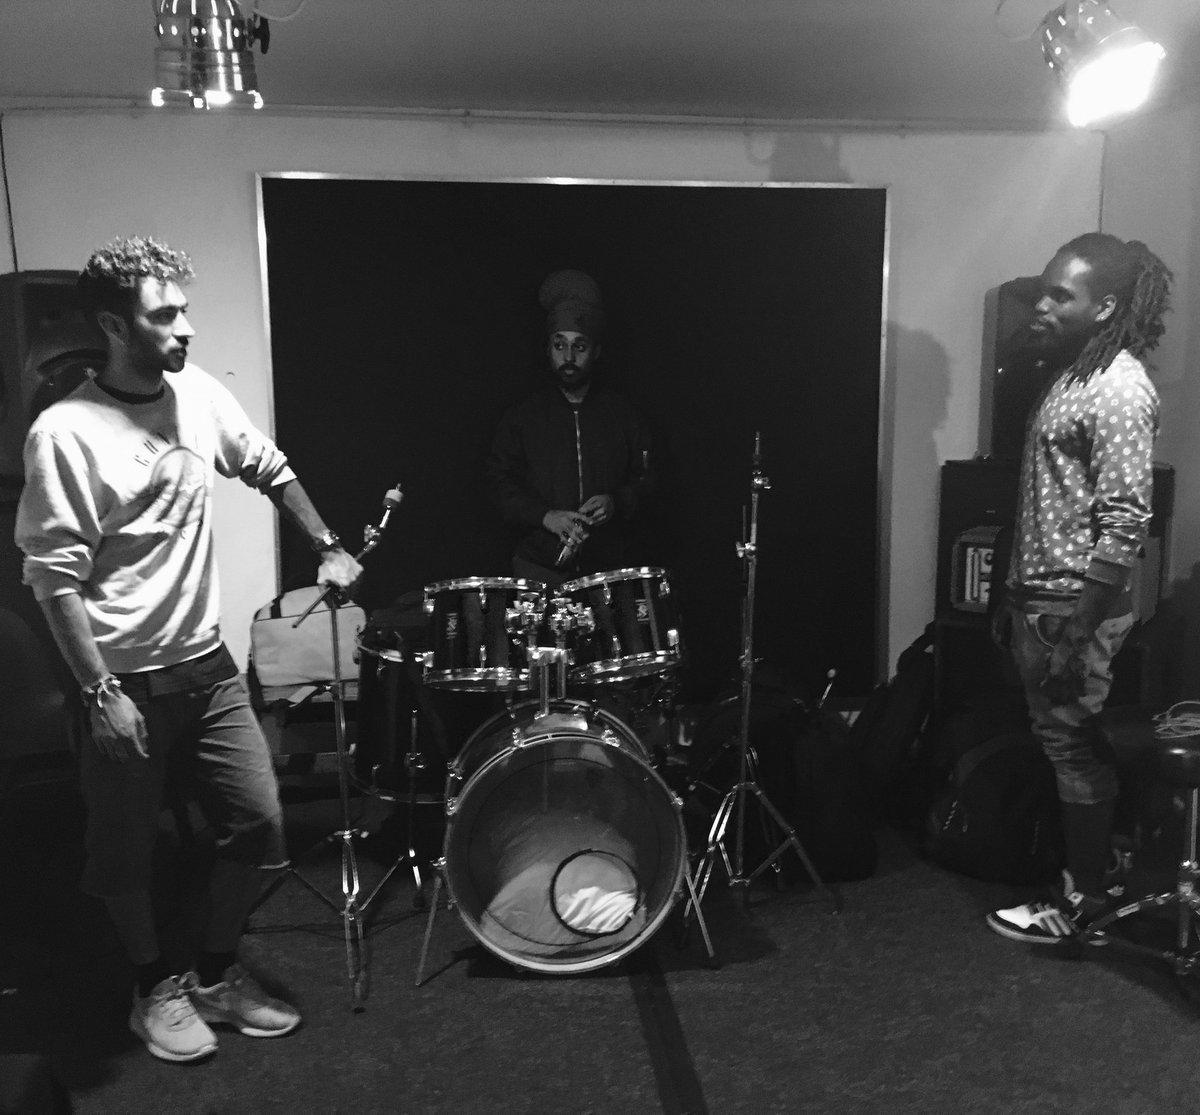 Serious moment in rehearsal.....ha #musicians <br>http://pic.twitter.com/ec7V610U5D